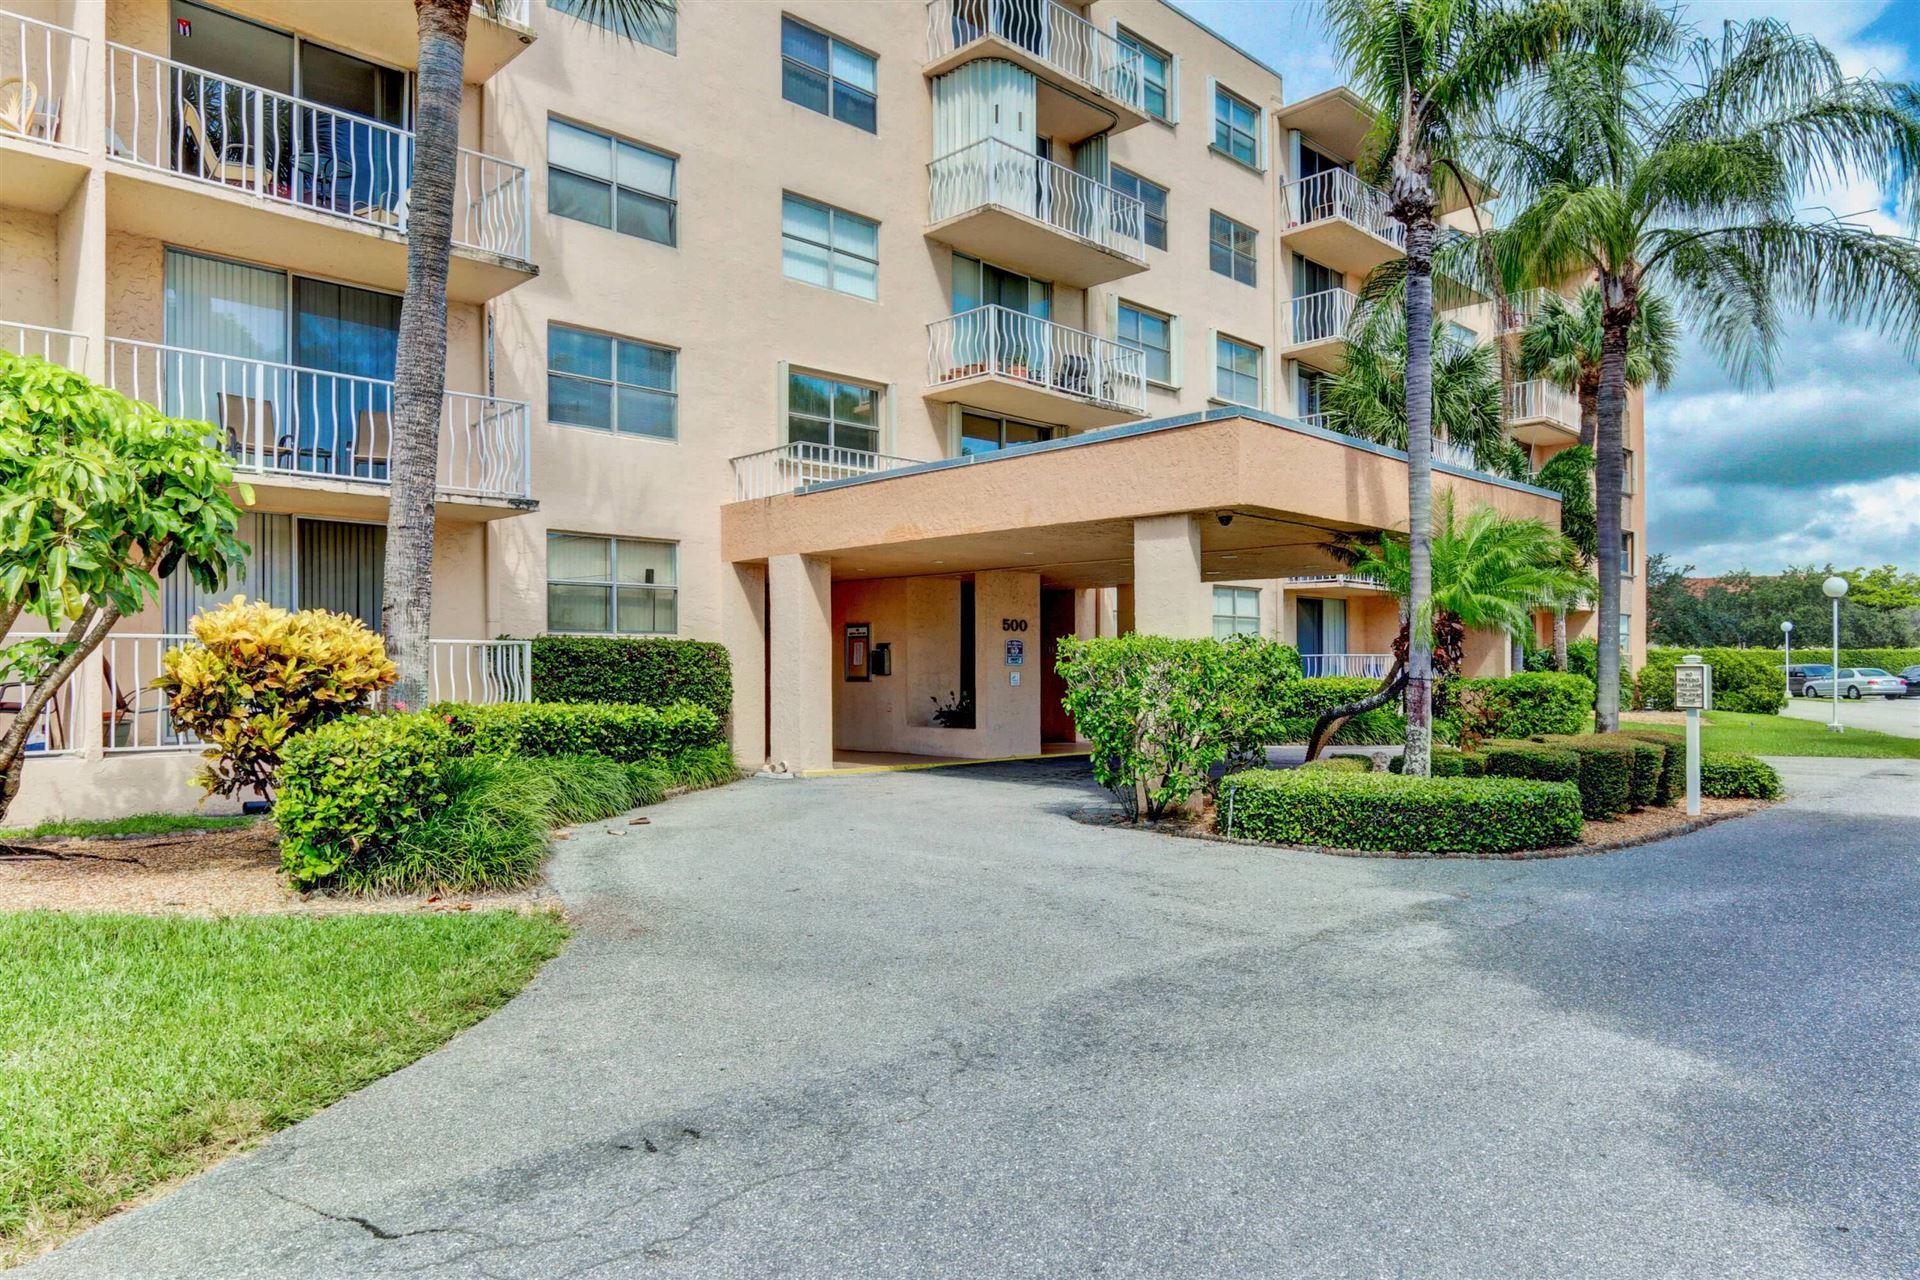 500 Executive Center Drive #5l, West Palm Beach, FL 33401 - MLS#: RX-10747164